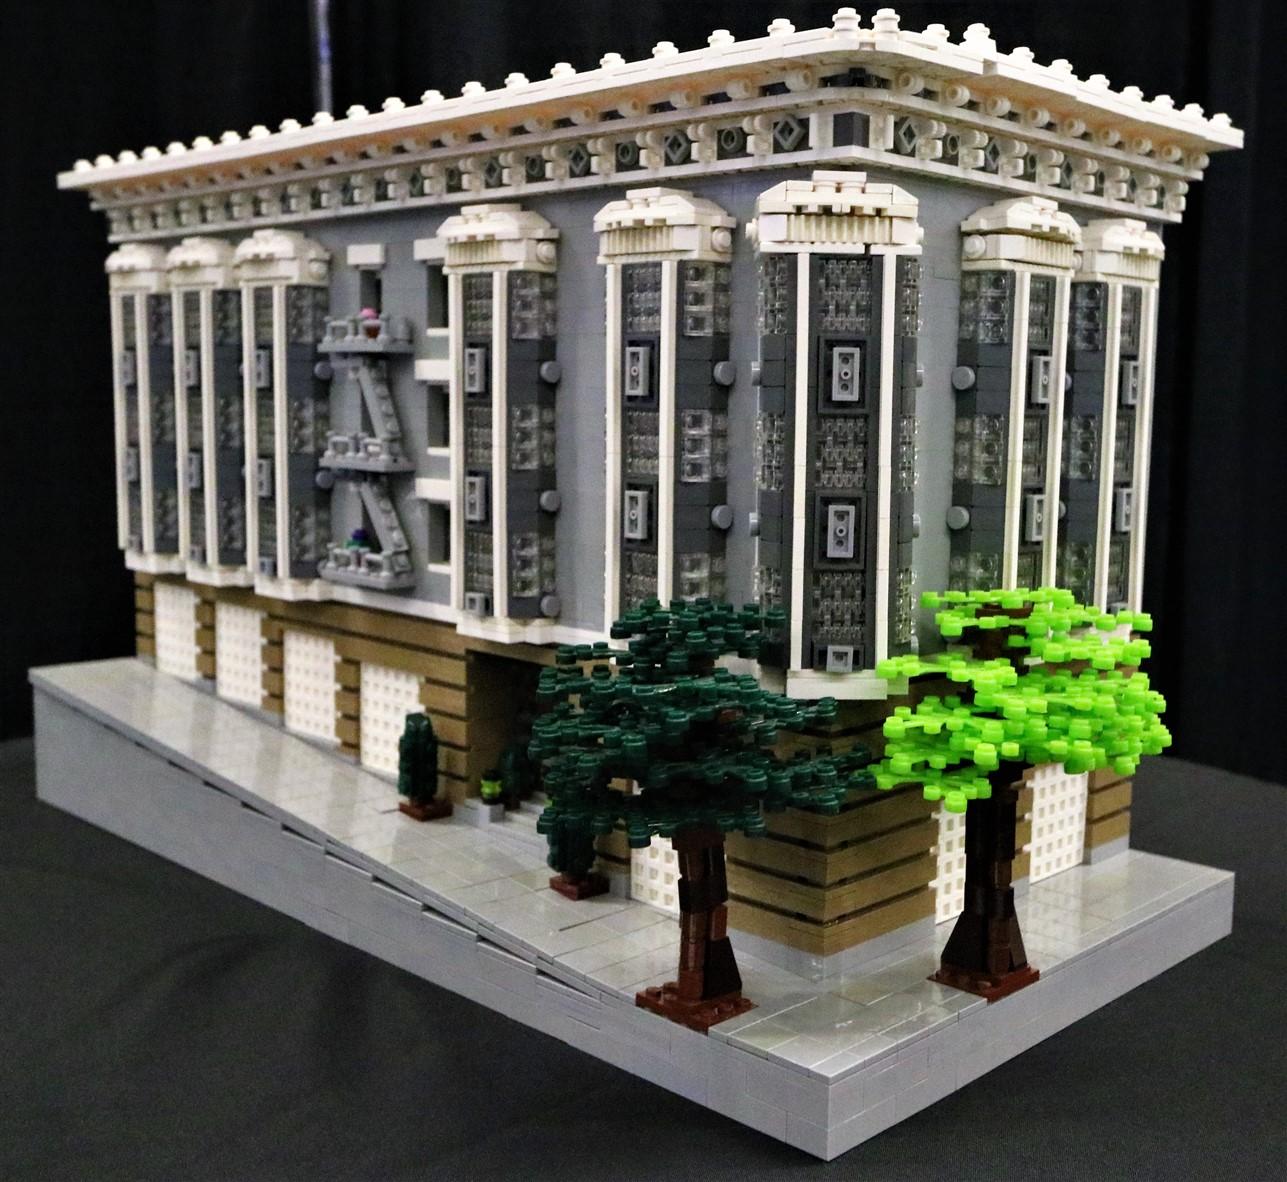 2017 09 30 5 Cleveland Lego Convention.jpg